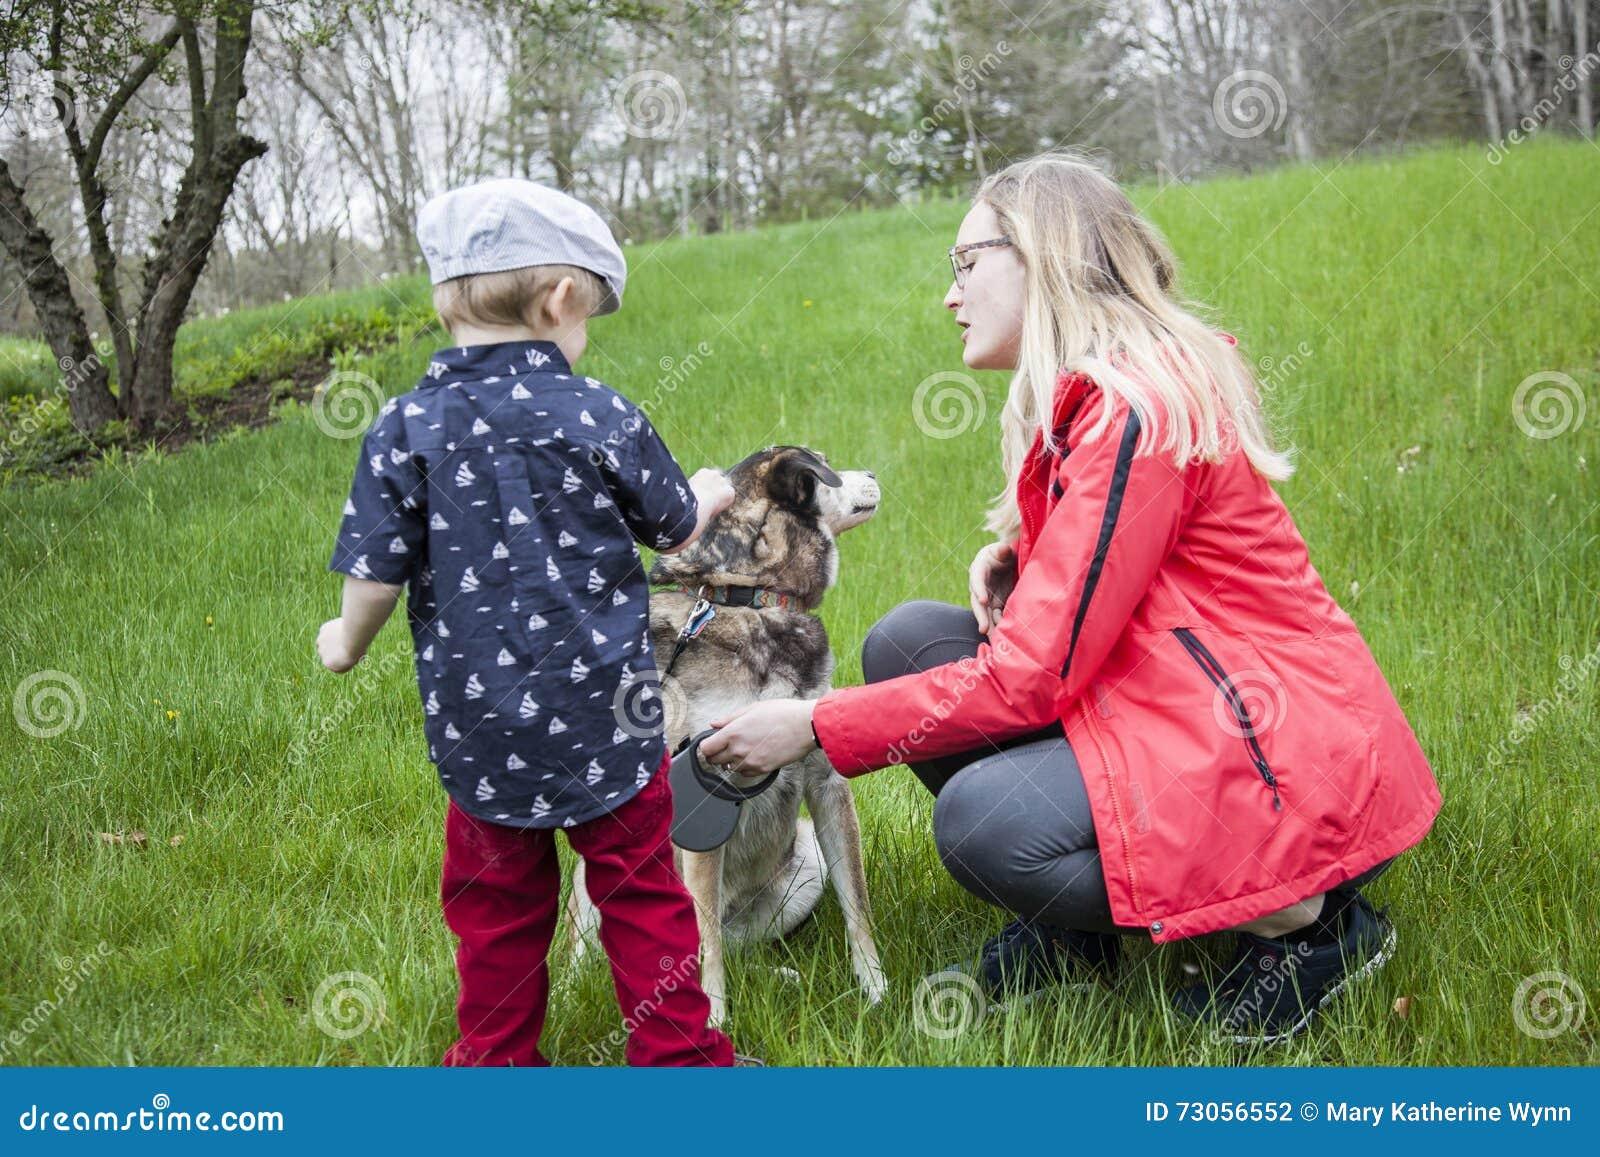 Boy meeting a new dog